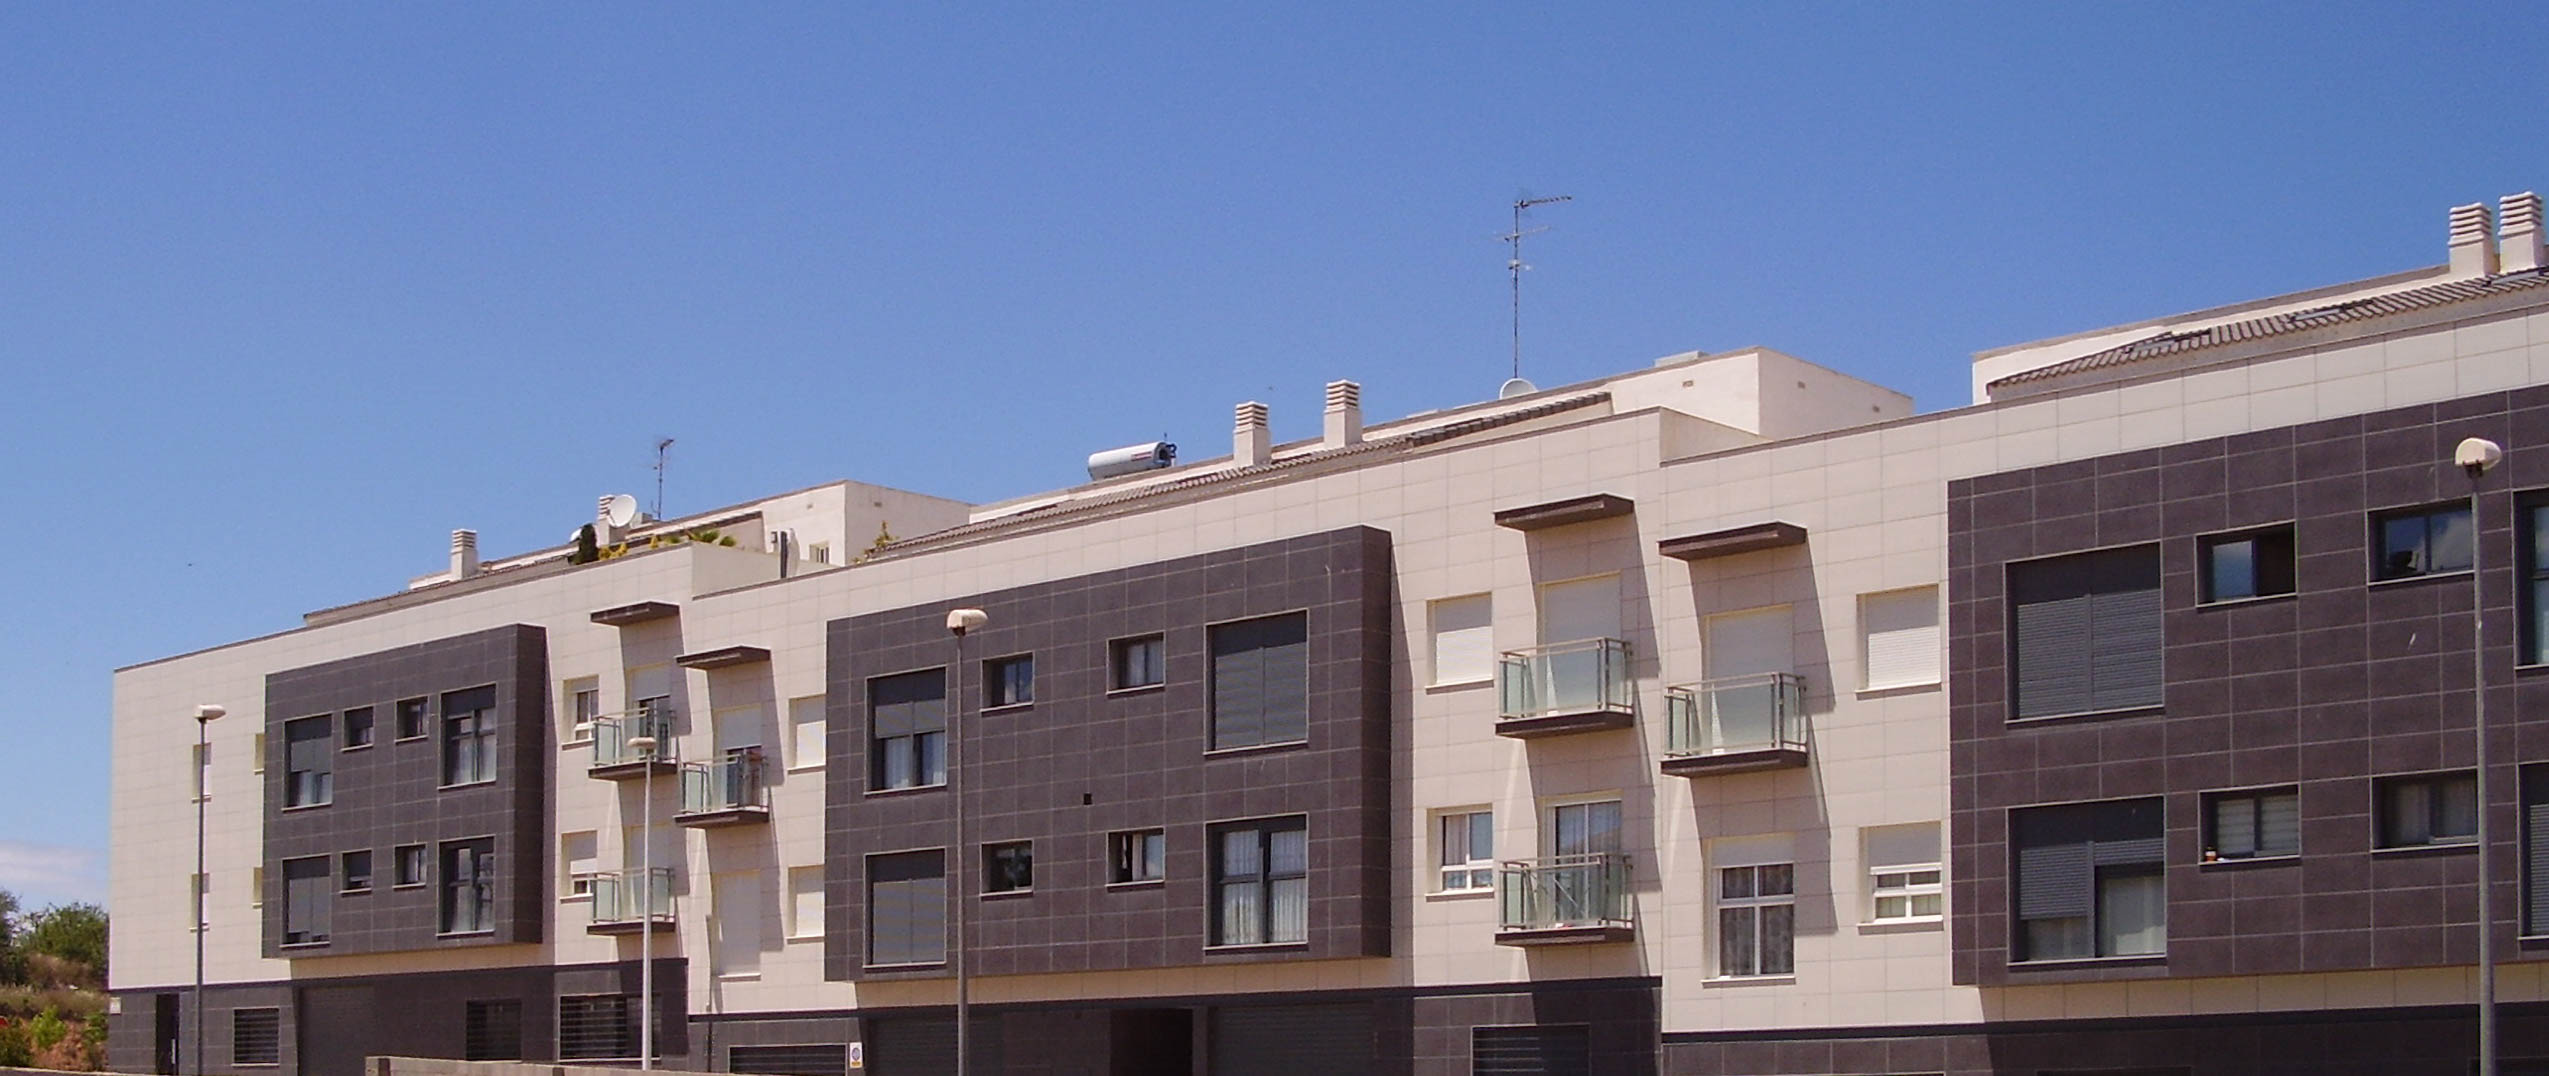 martinez anton arquitectos valencia edificio de viviendas